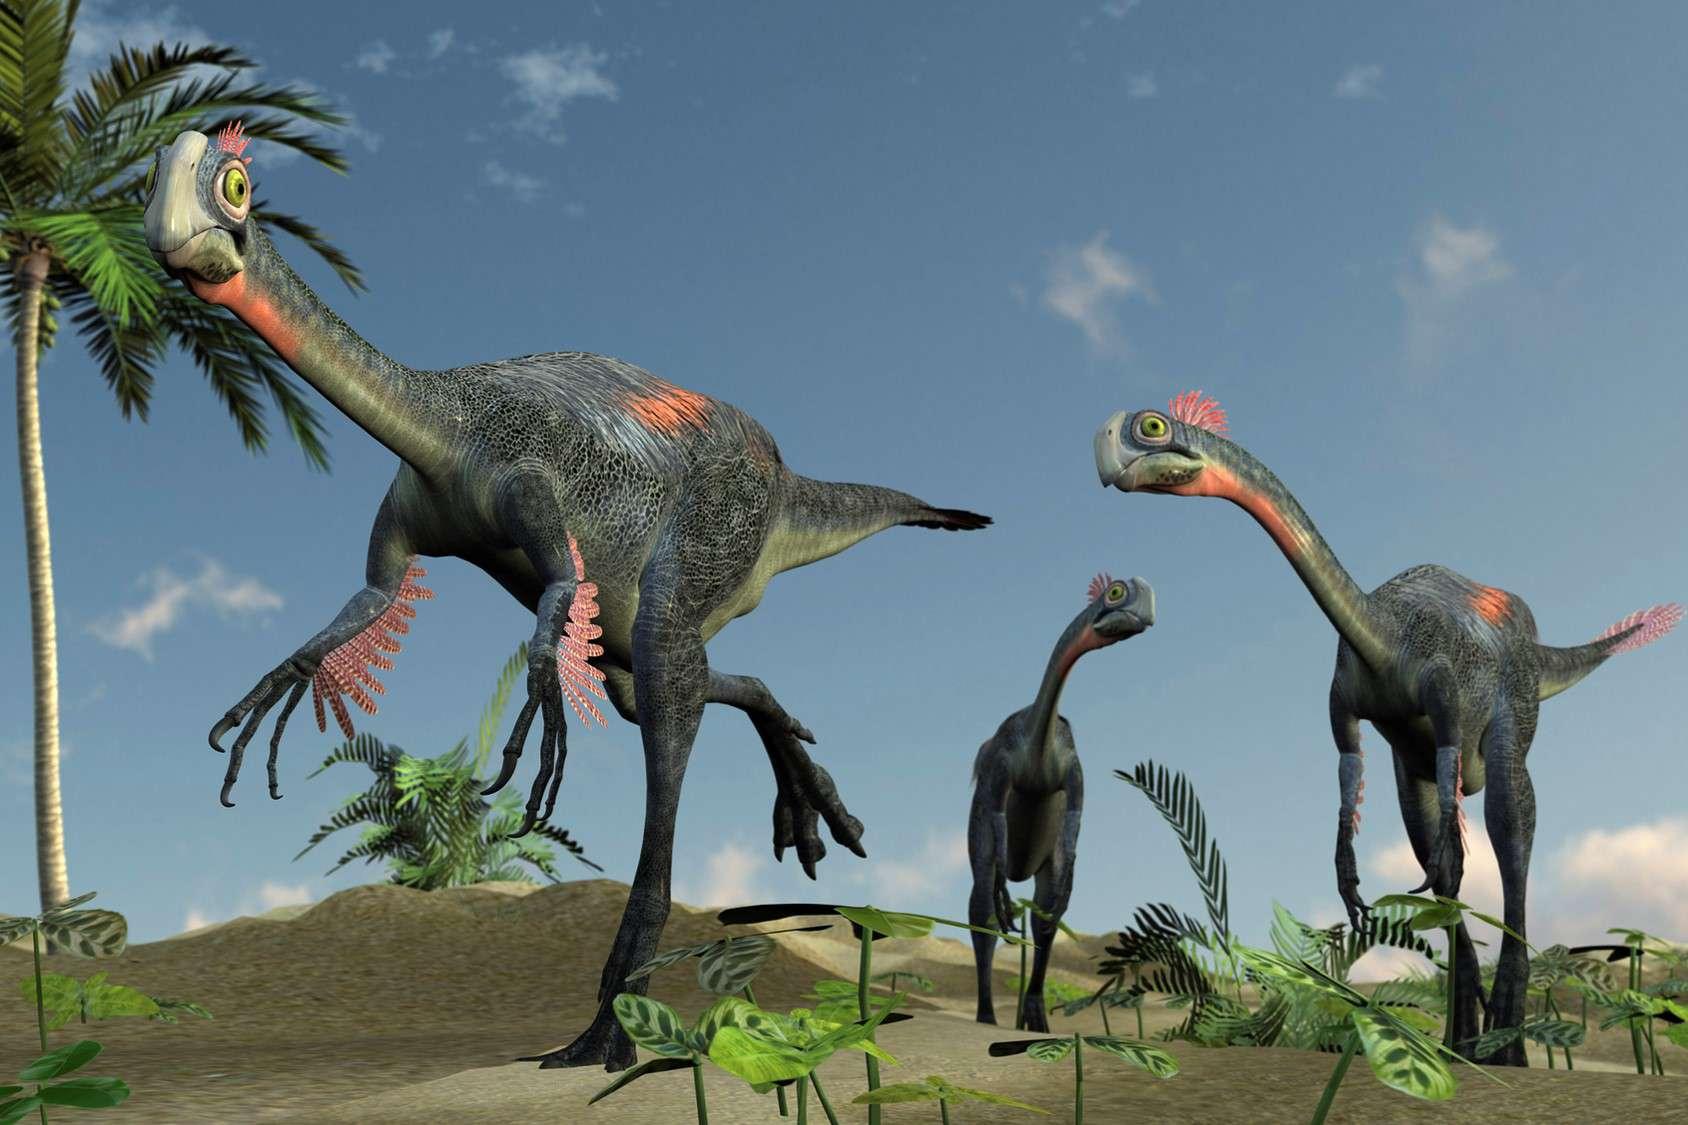 Gigantoraptors on land